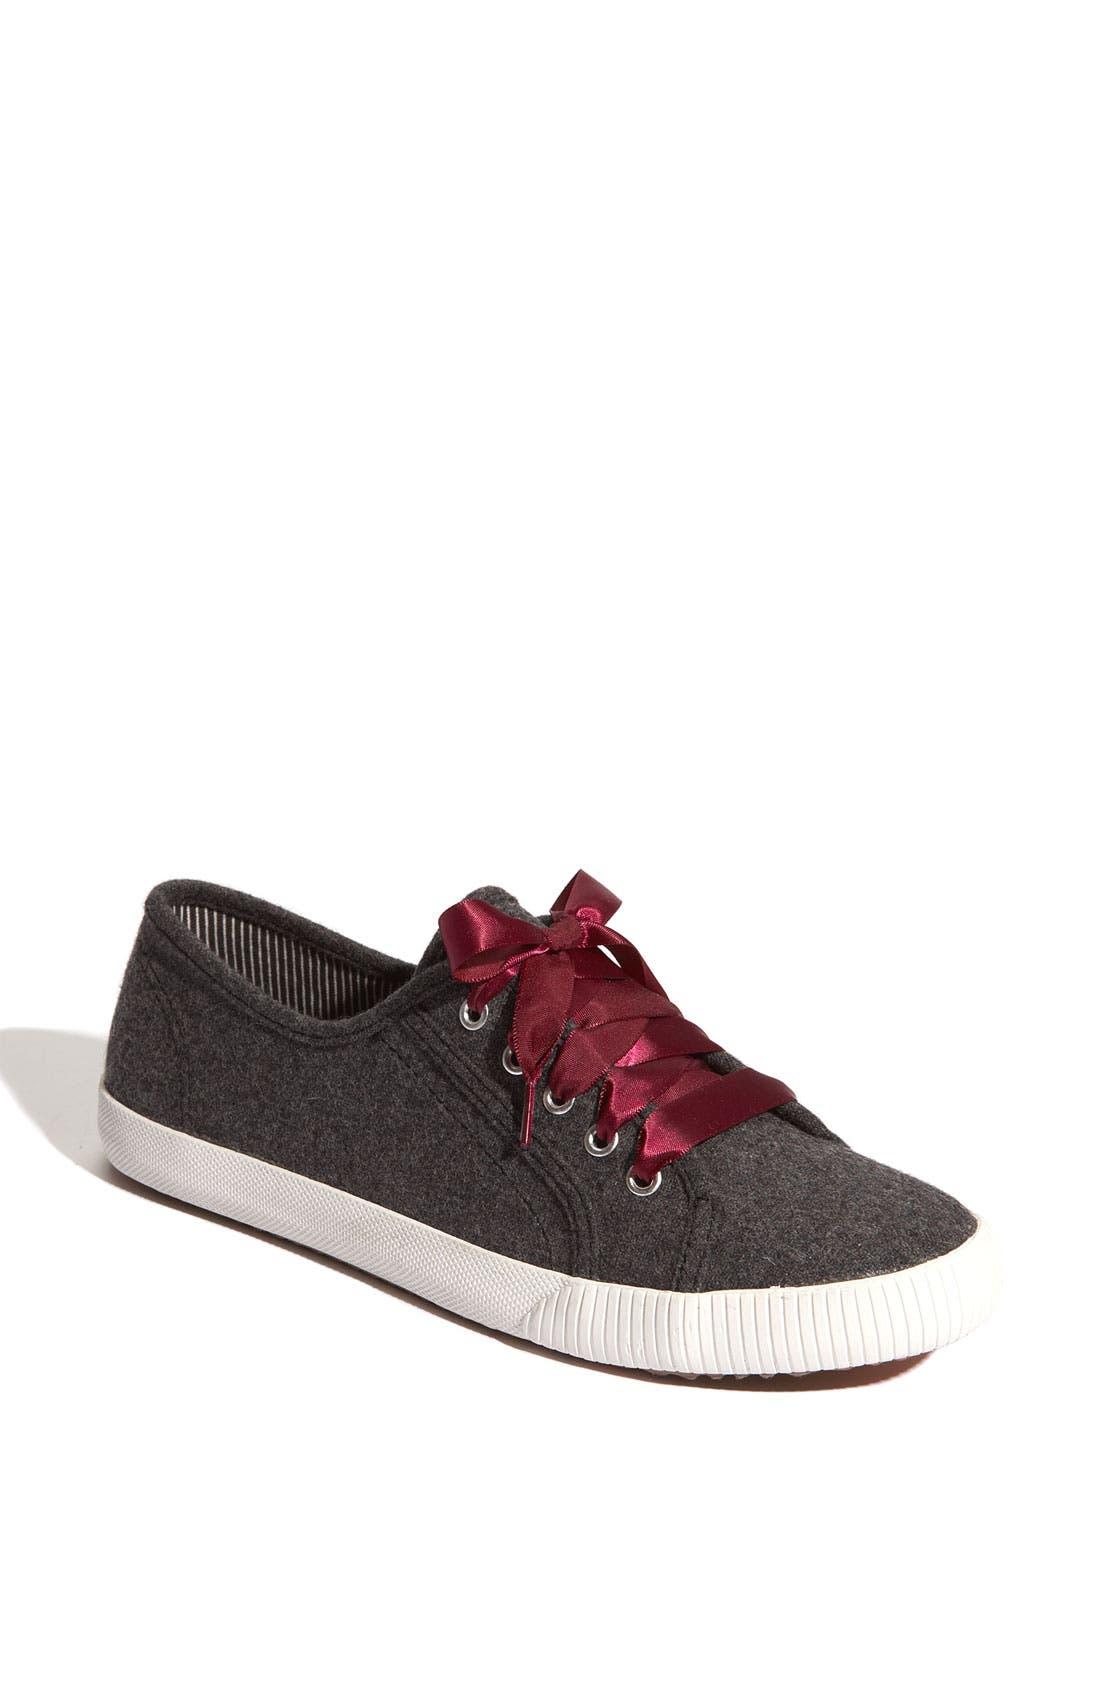 Main Image - Keds® 'Champion - Celeb Wooly' Sneaker